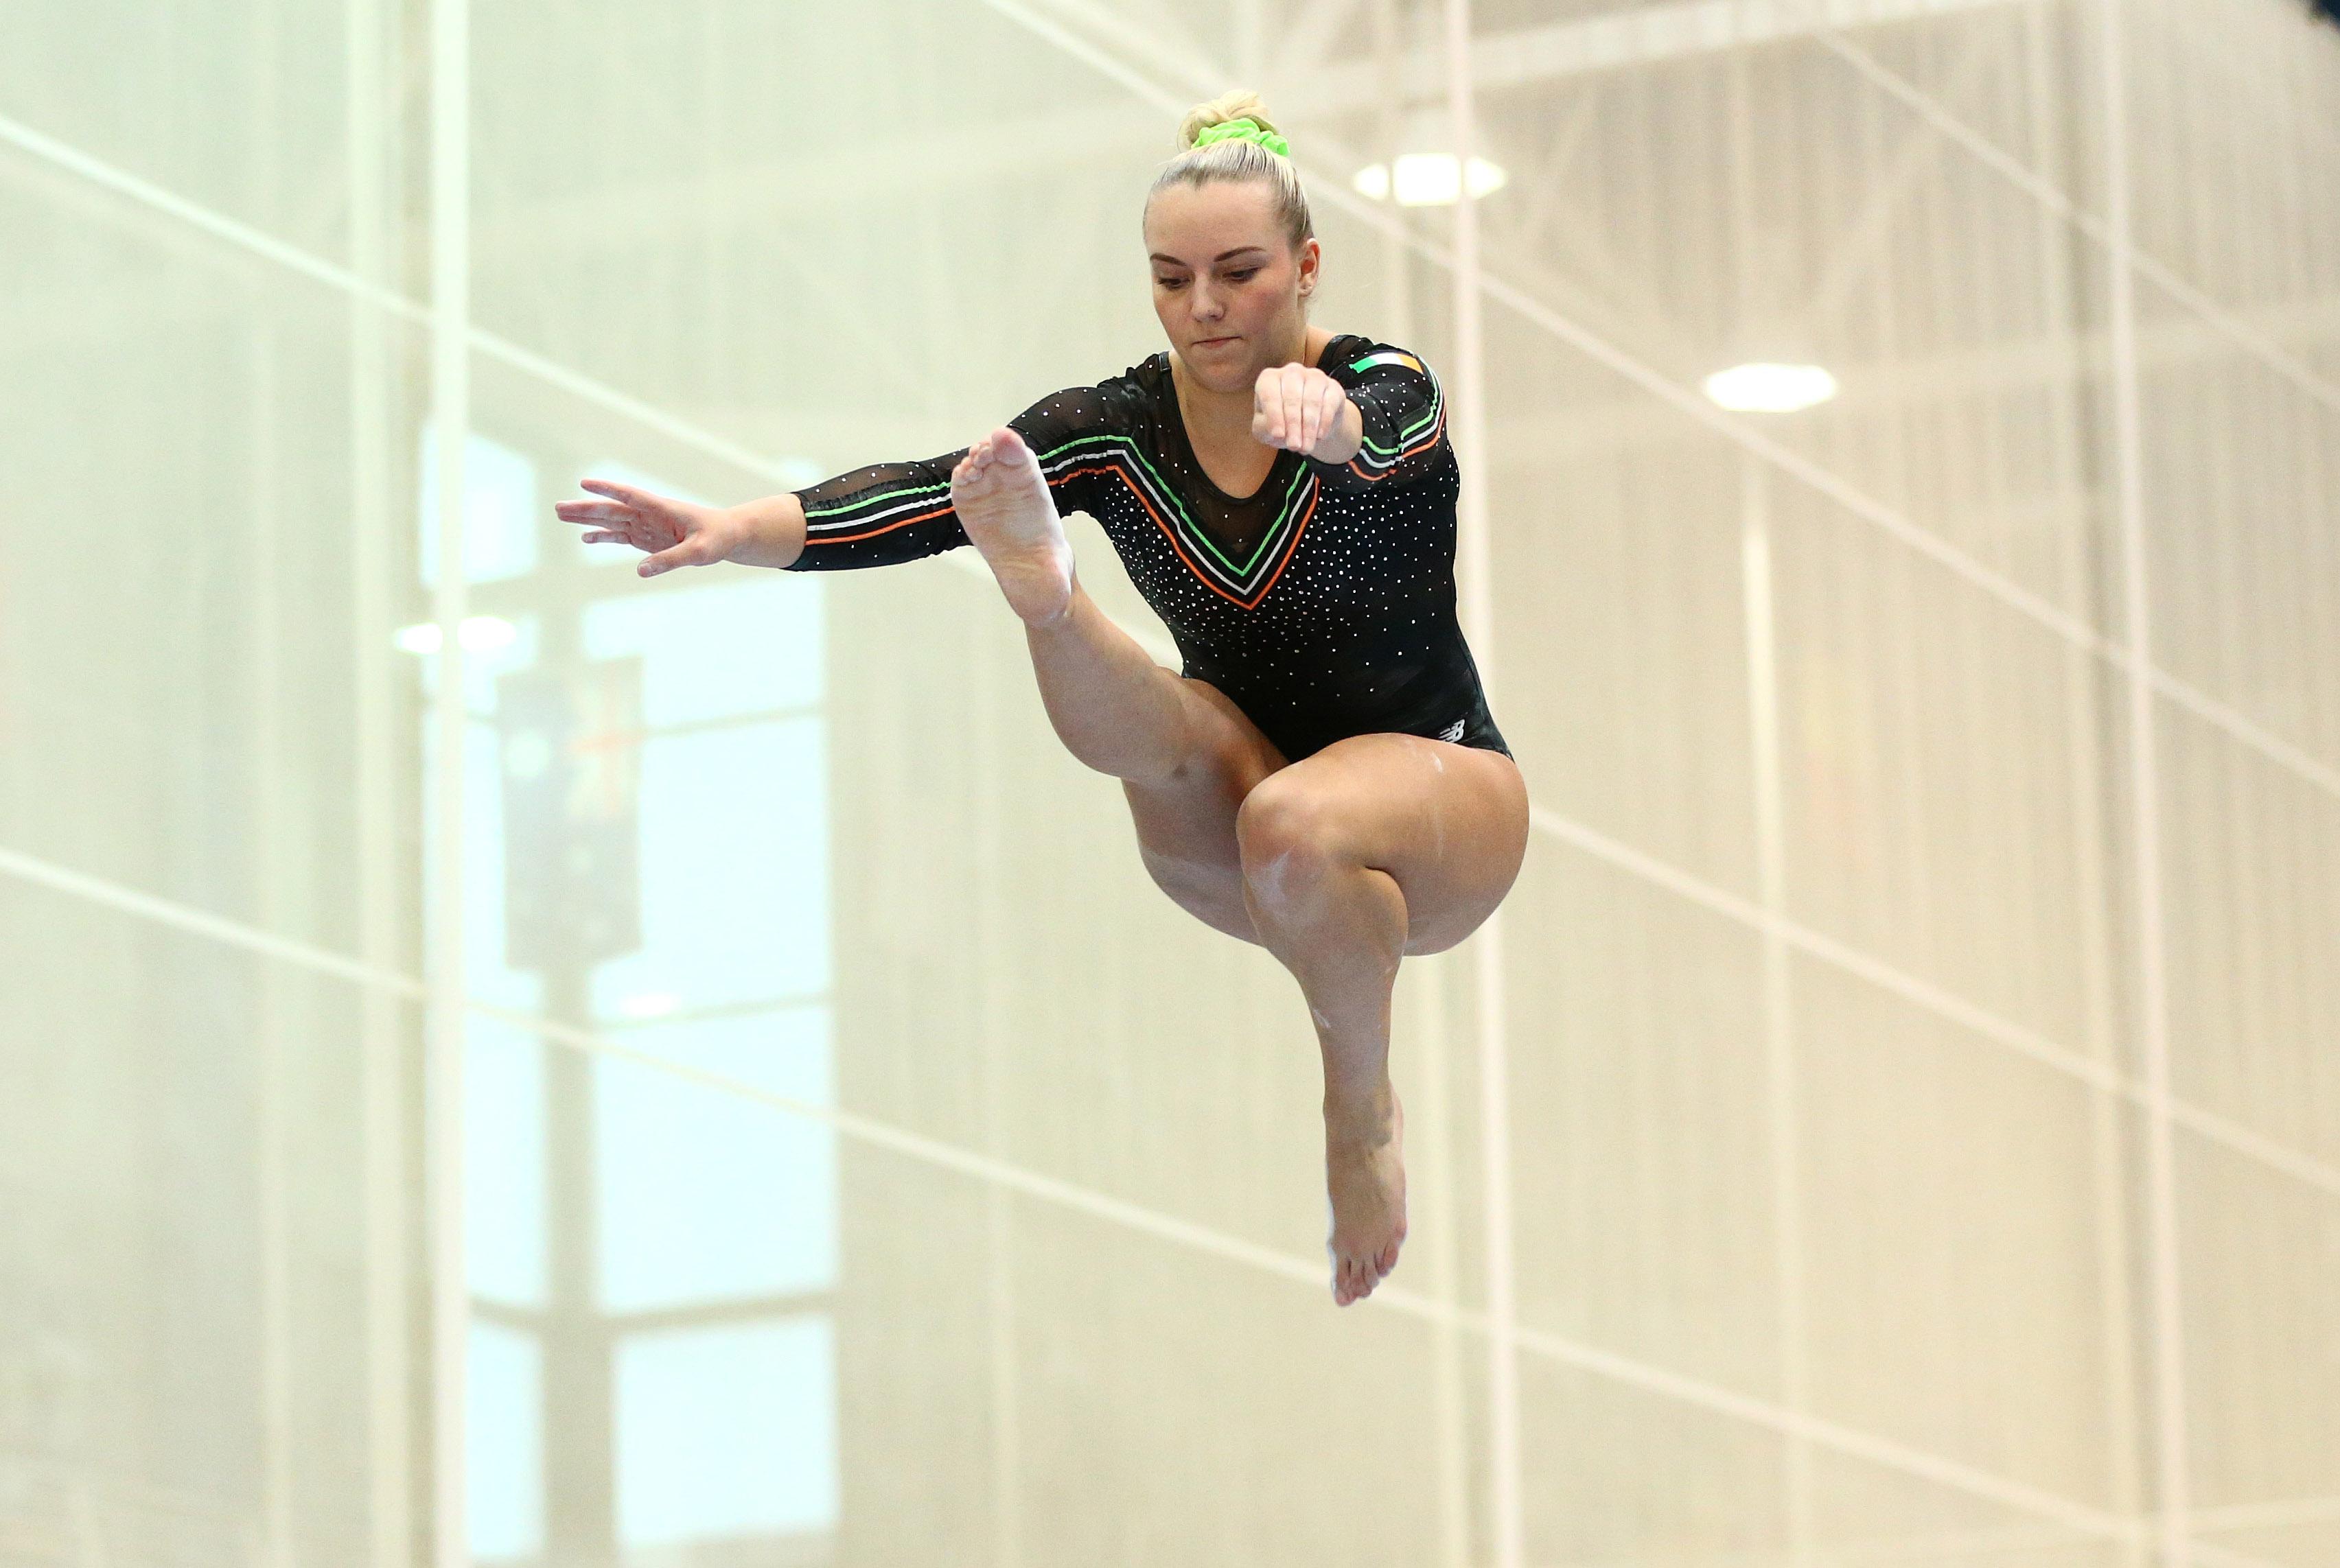 The Northern European Gymnastics Championships, University of Limerick Sports Arena, Limerick 19/9/2015 Ireland's Ellis O'Reilly on the beam exercise  Mandatory Credit ©INPHO/Cathal Noonan